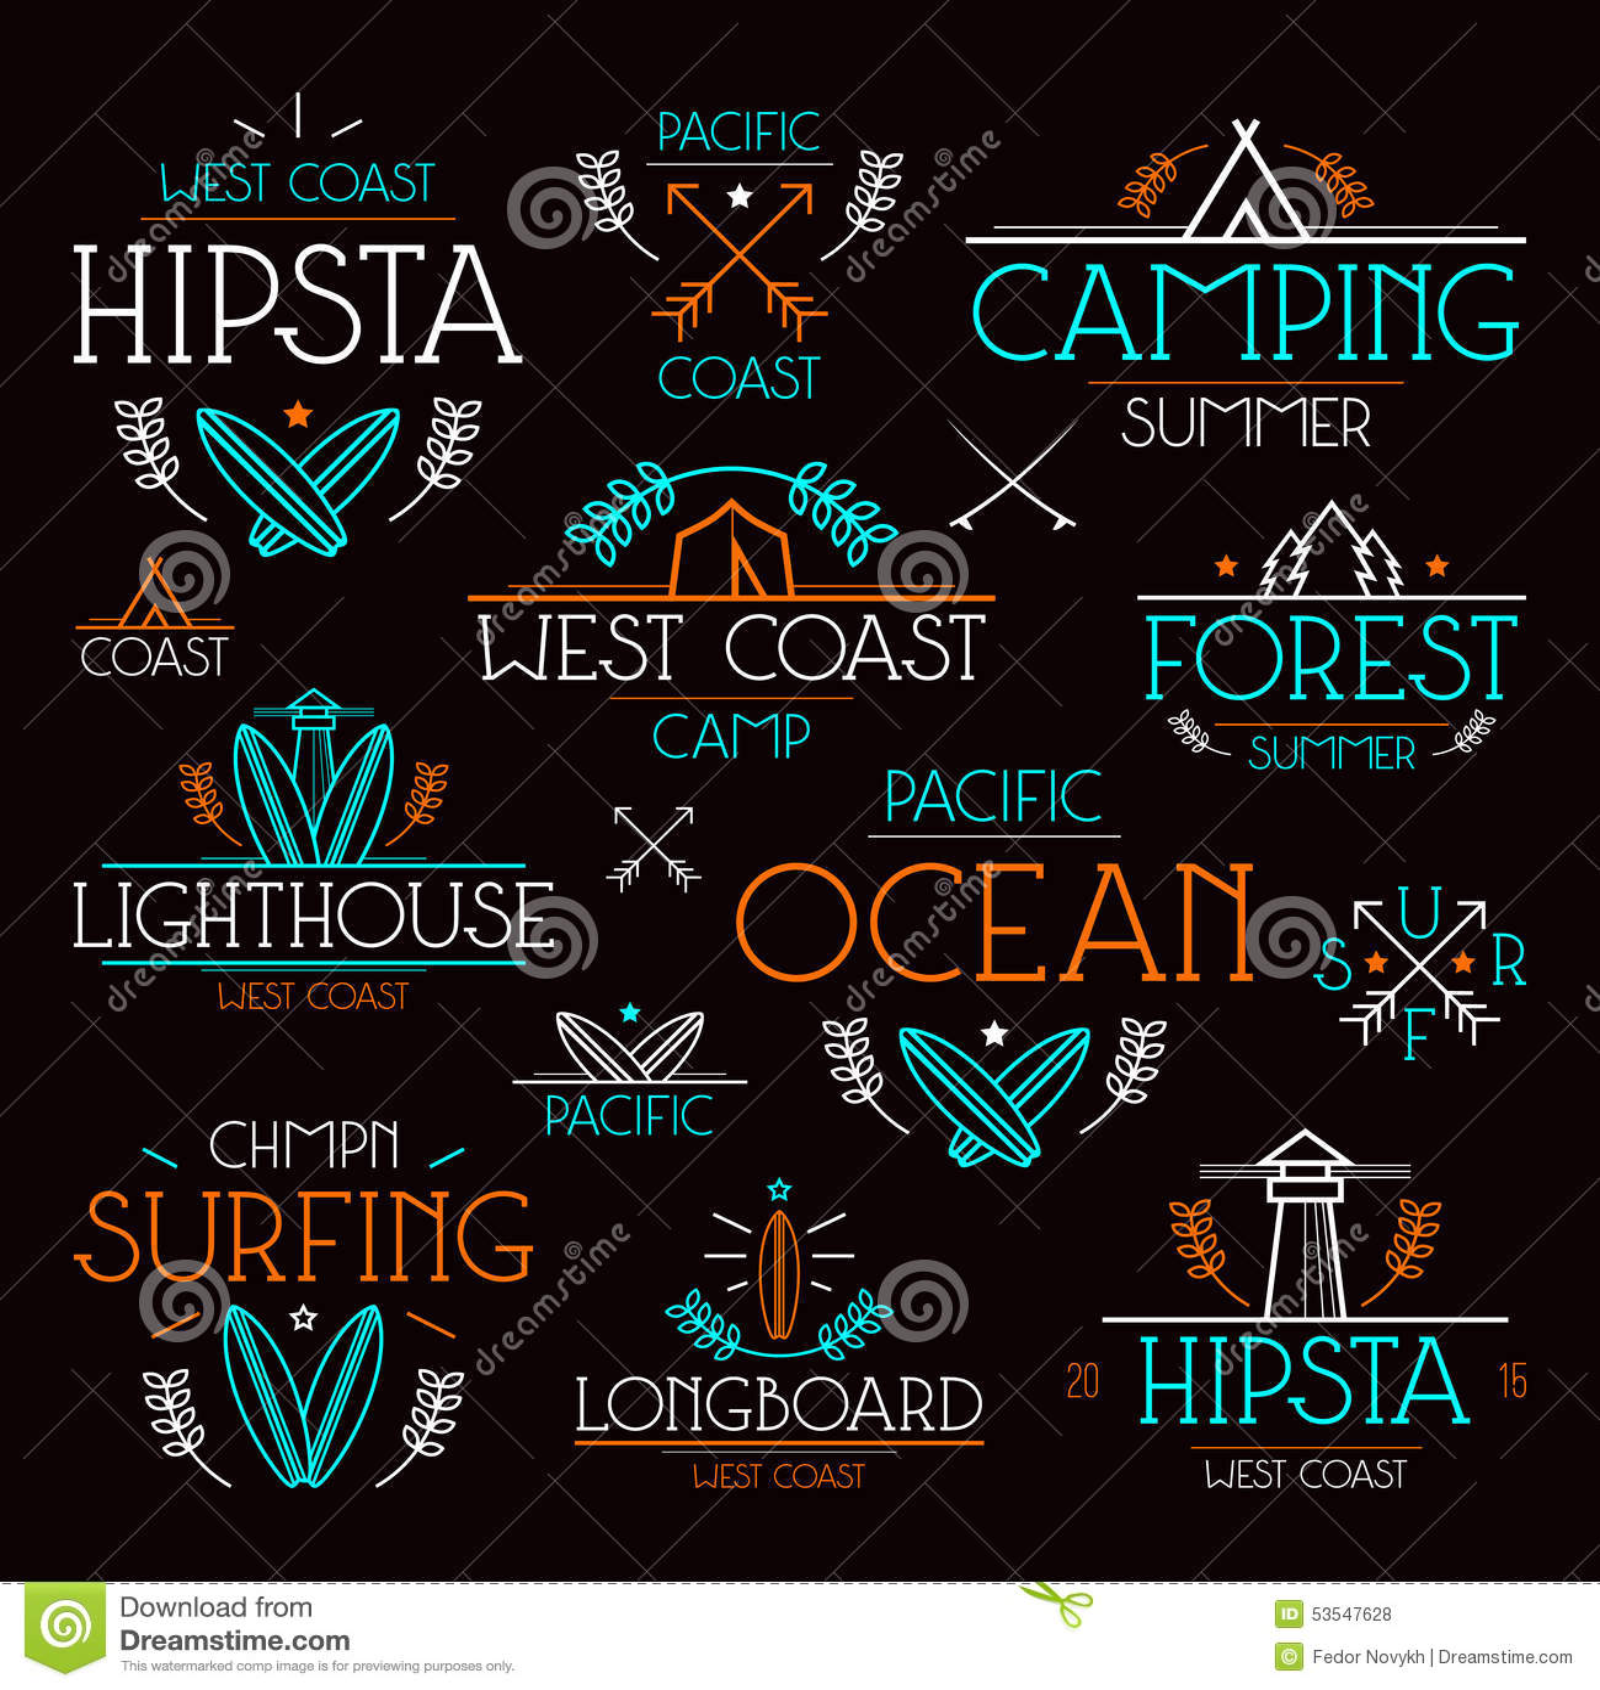 Design t shirt neon colors - Design T Shirt Neon Colors Surfing And Camping Badges Surfing And Camping Badges In Thin